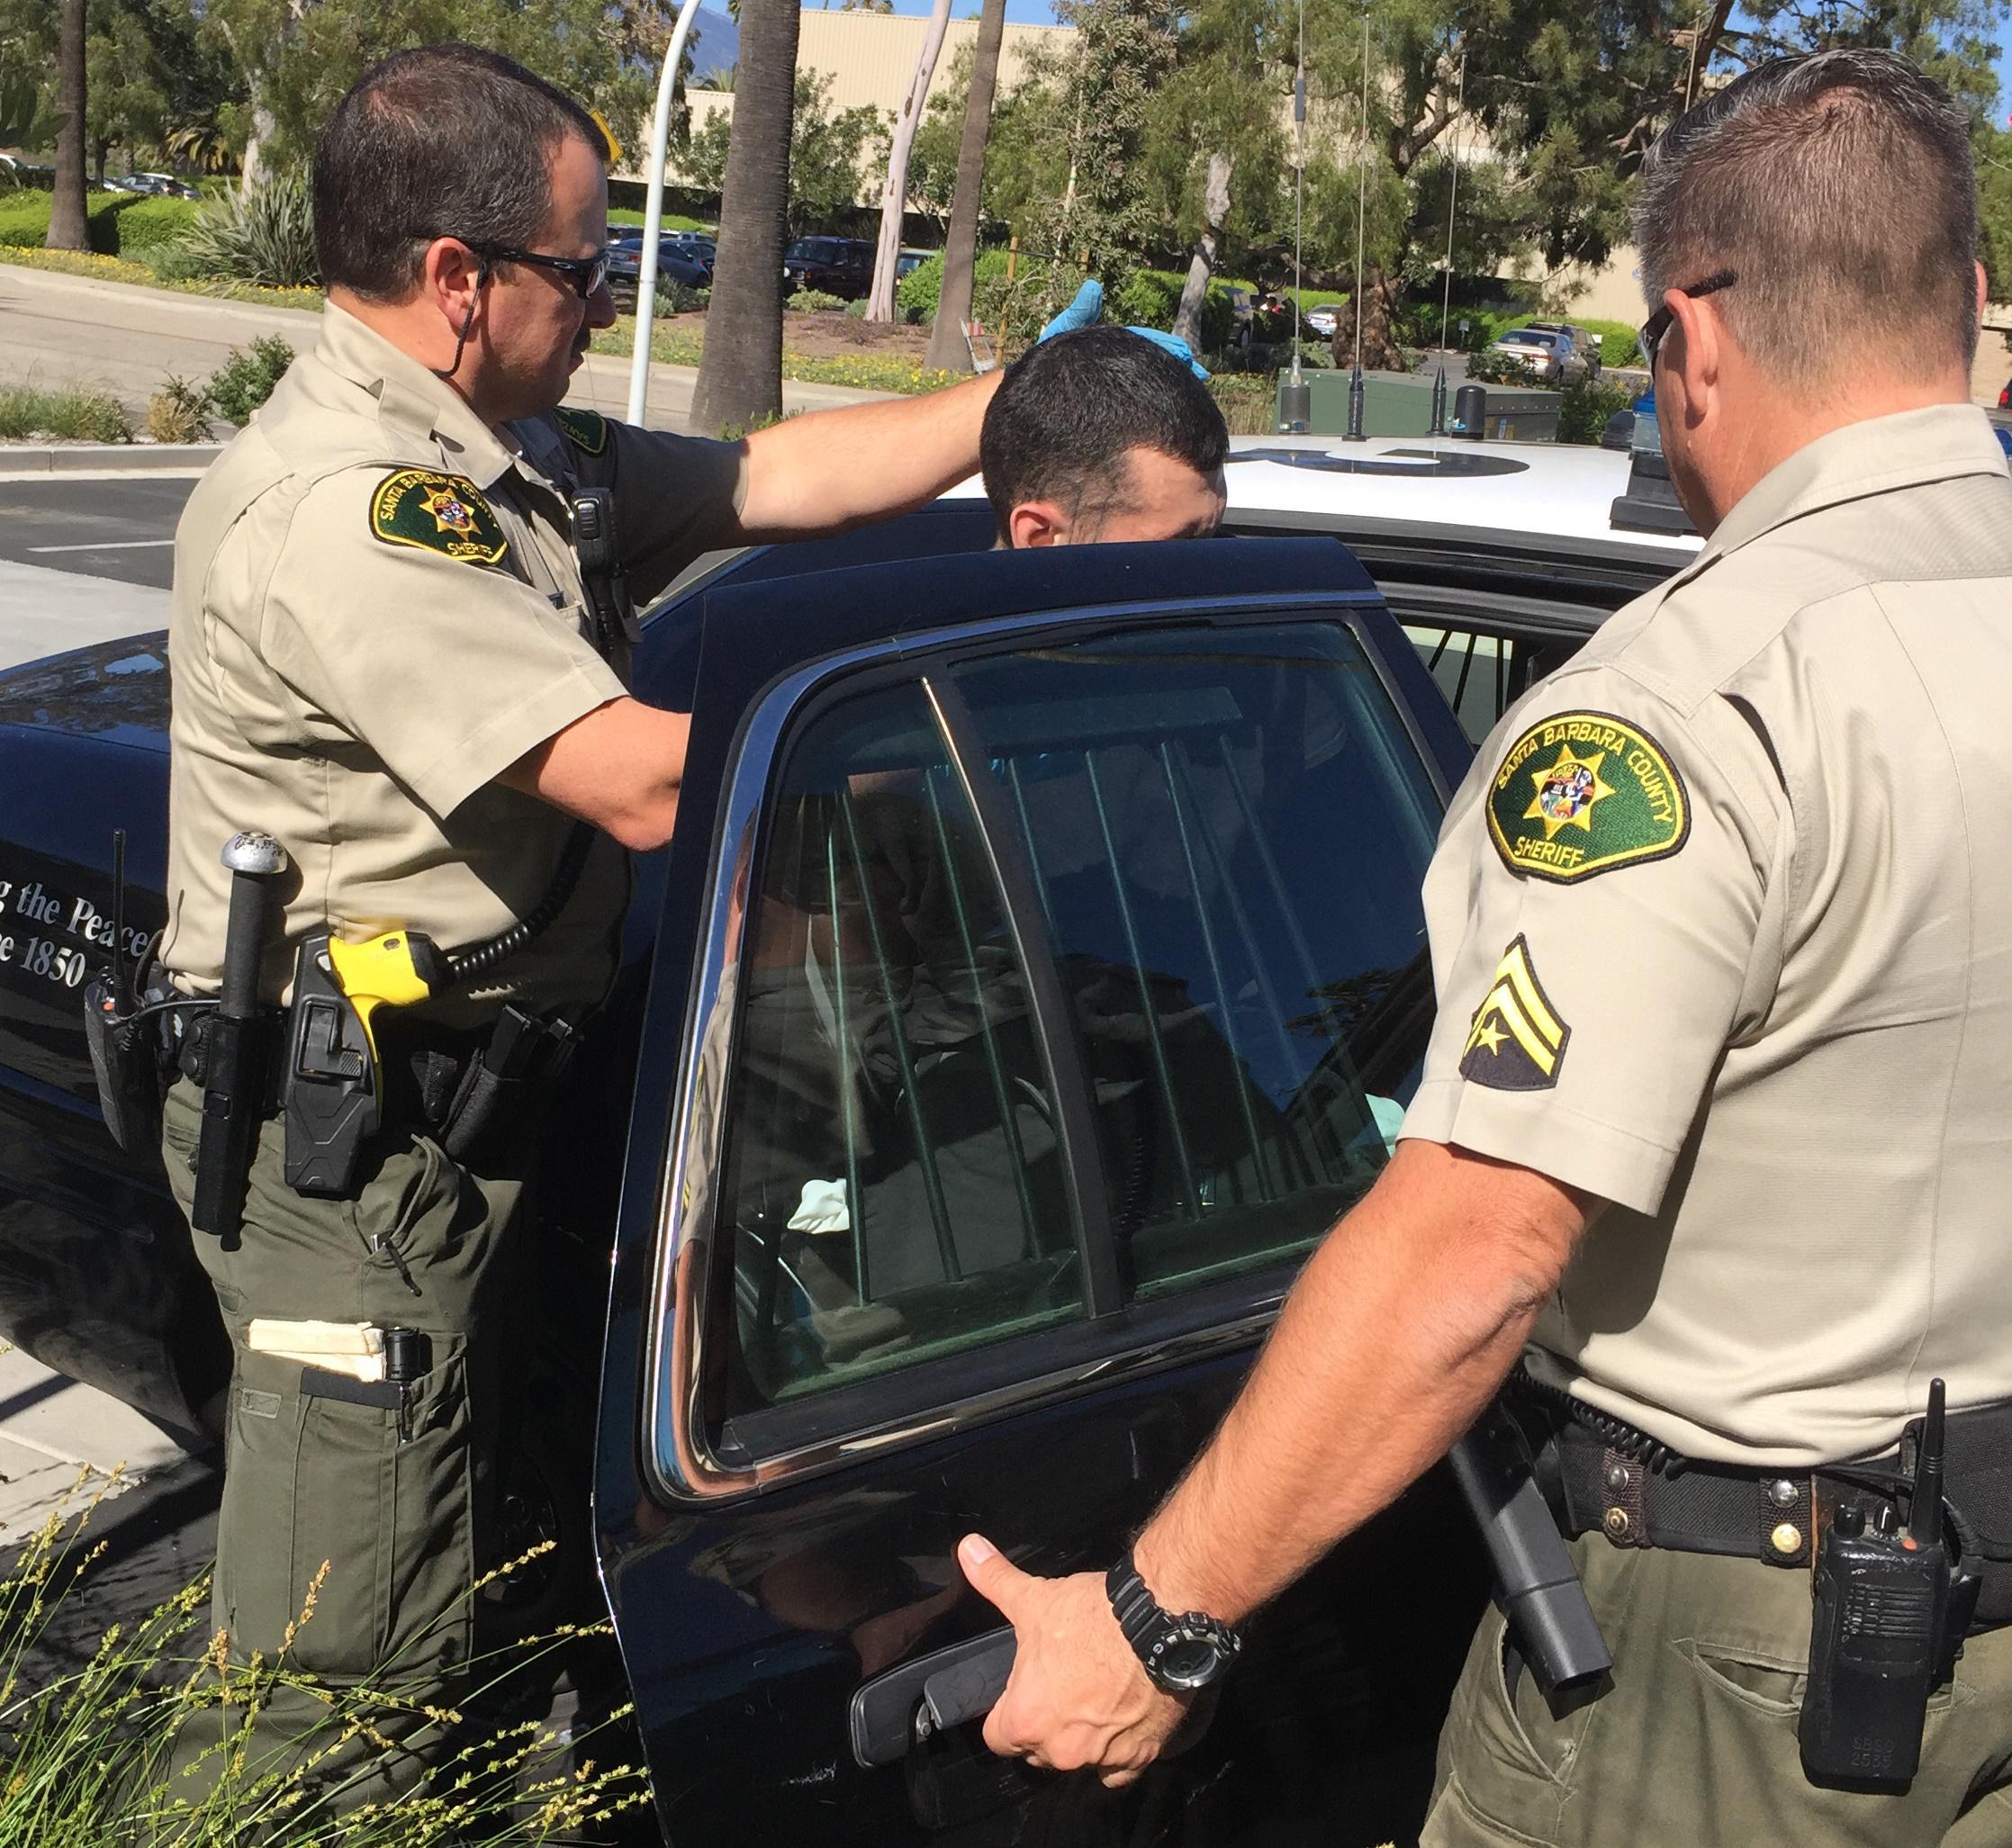 Officer Deputies Reasonable And Justified In Fatal: Santa Barbara County Sheriff's Deputy Injured In Pursuit